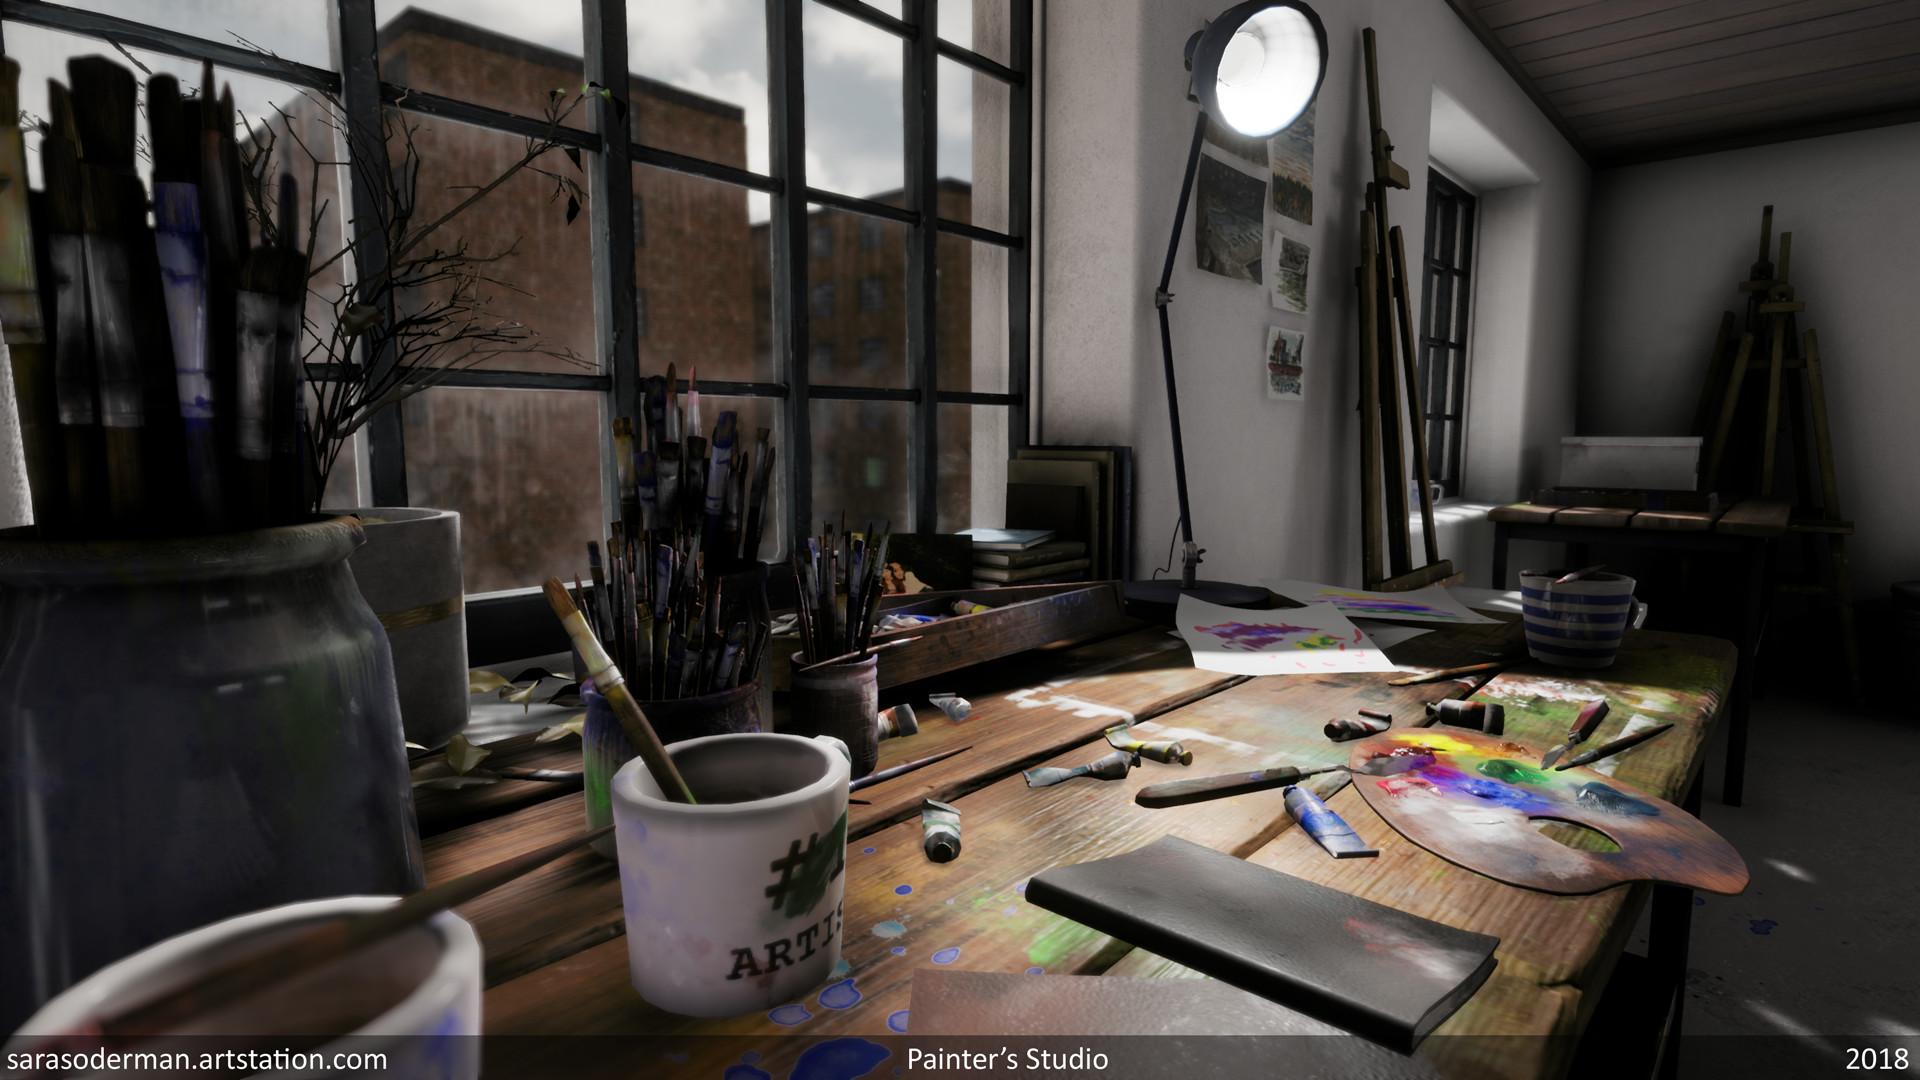 Sara soderman paintrender 01